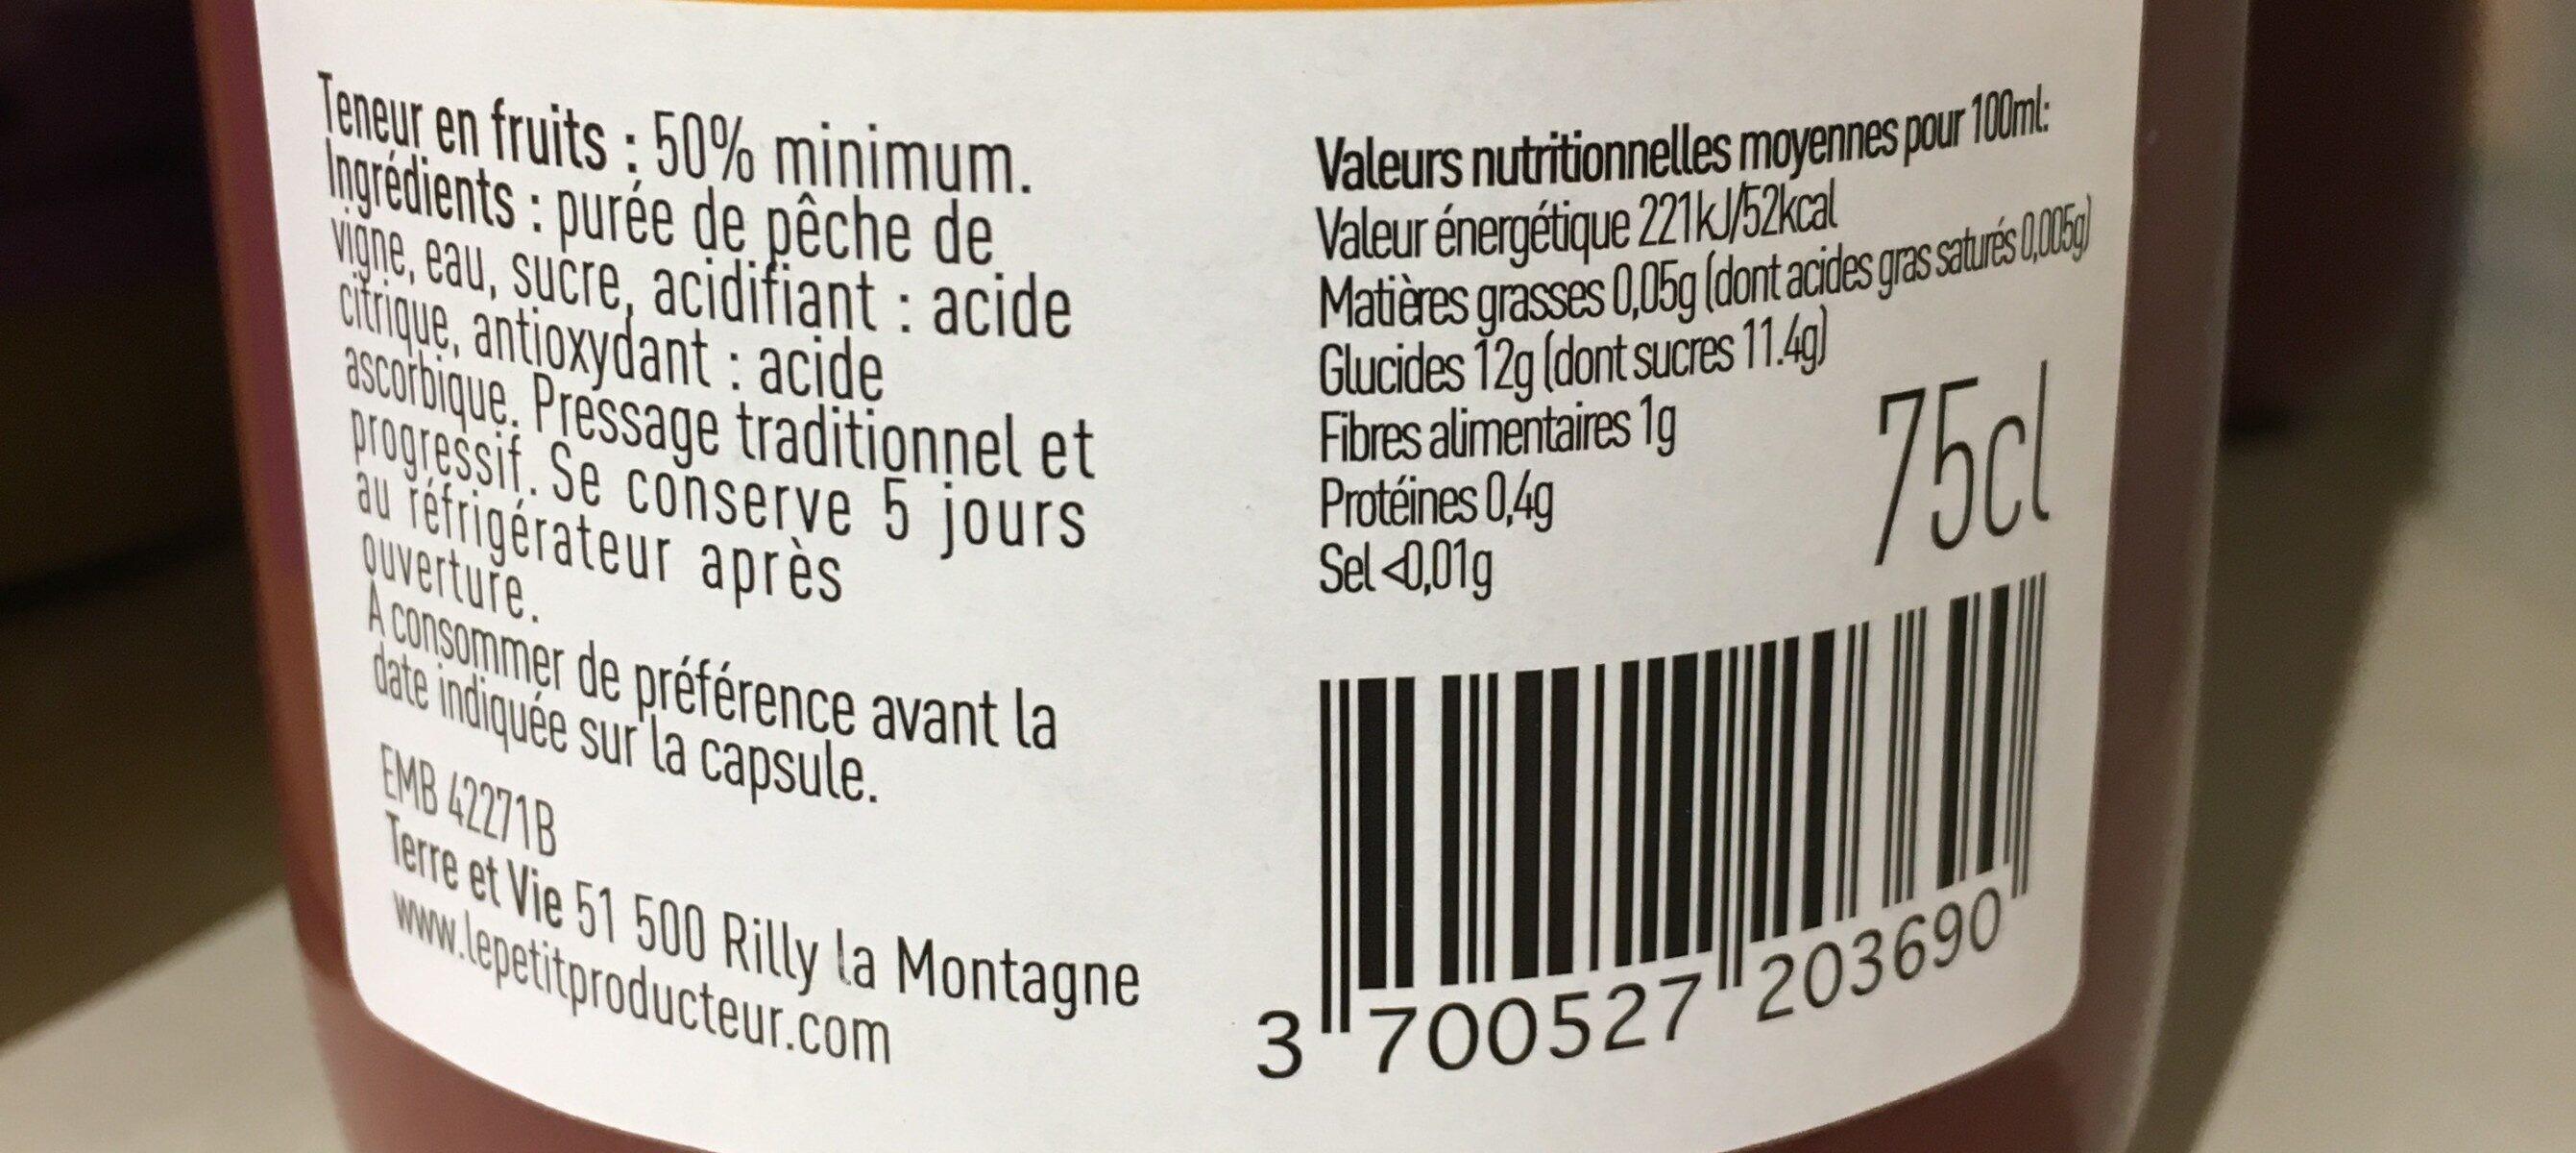 Nectar de pêche de vigne - Valori nutrizionali - fr